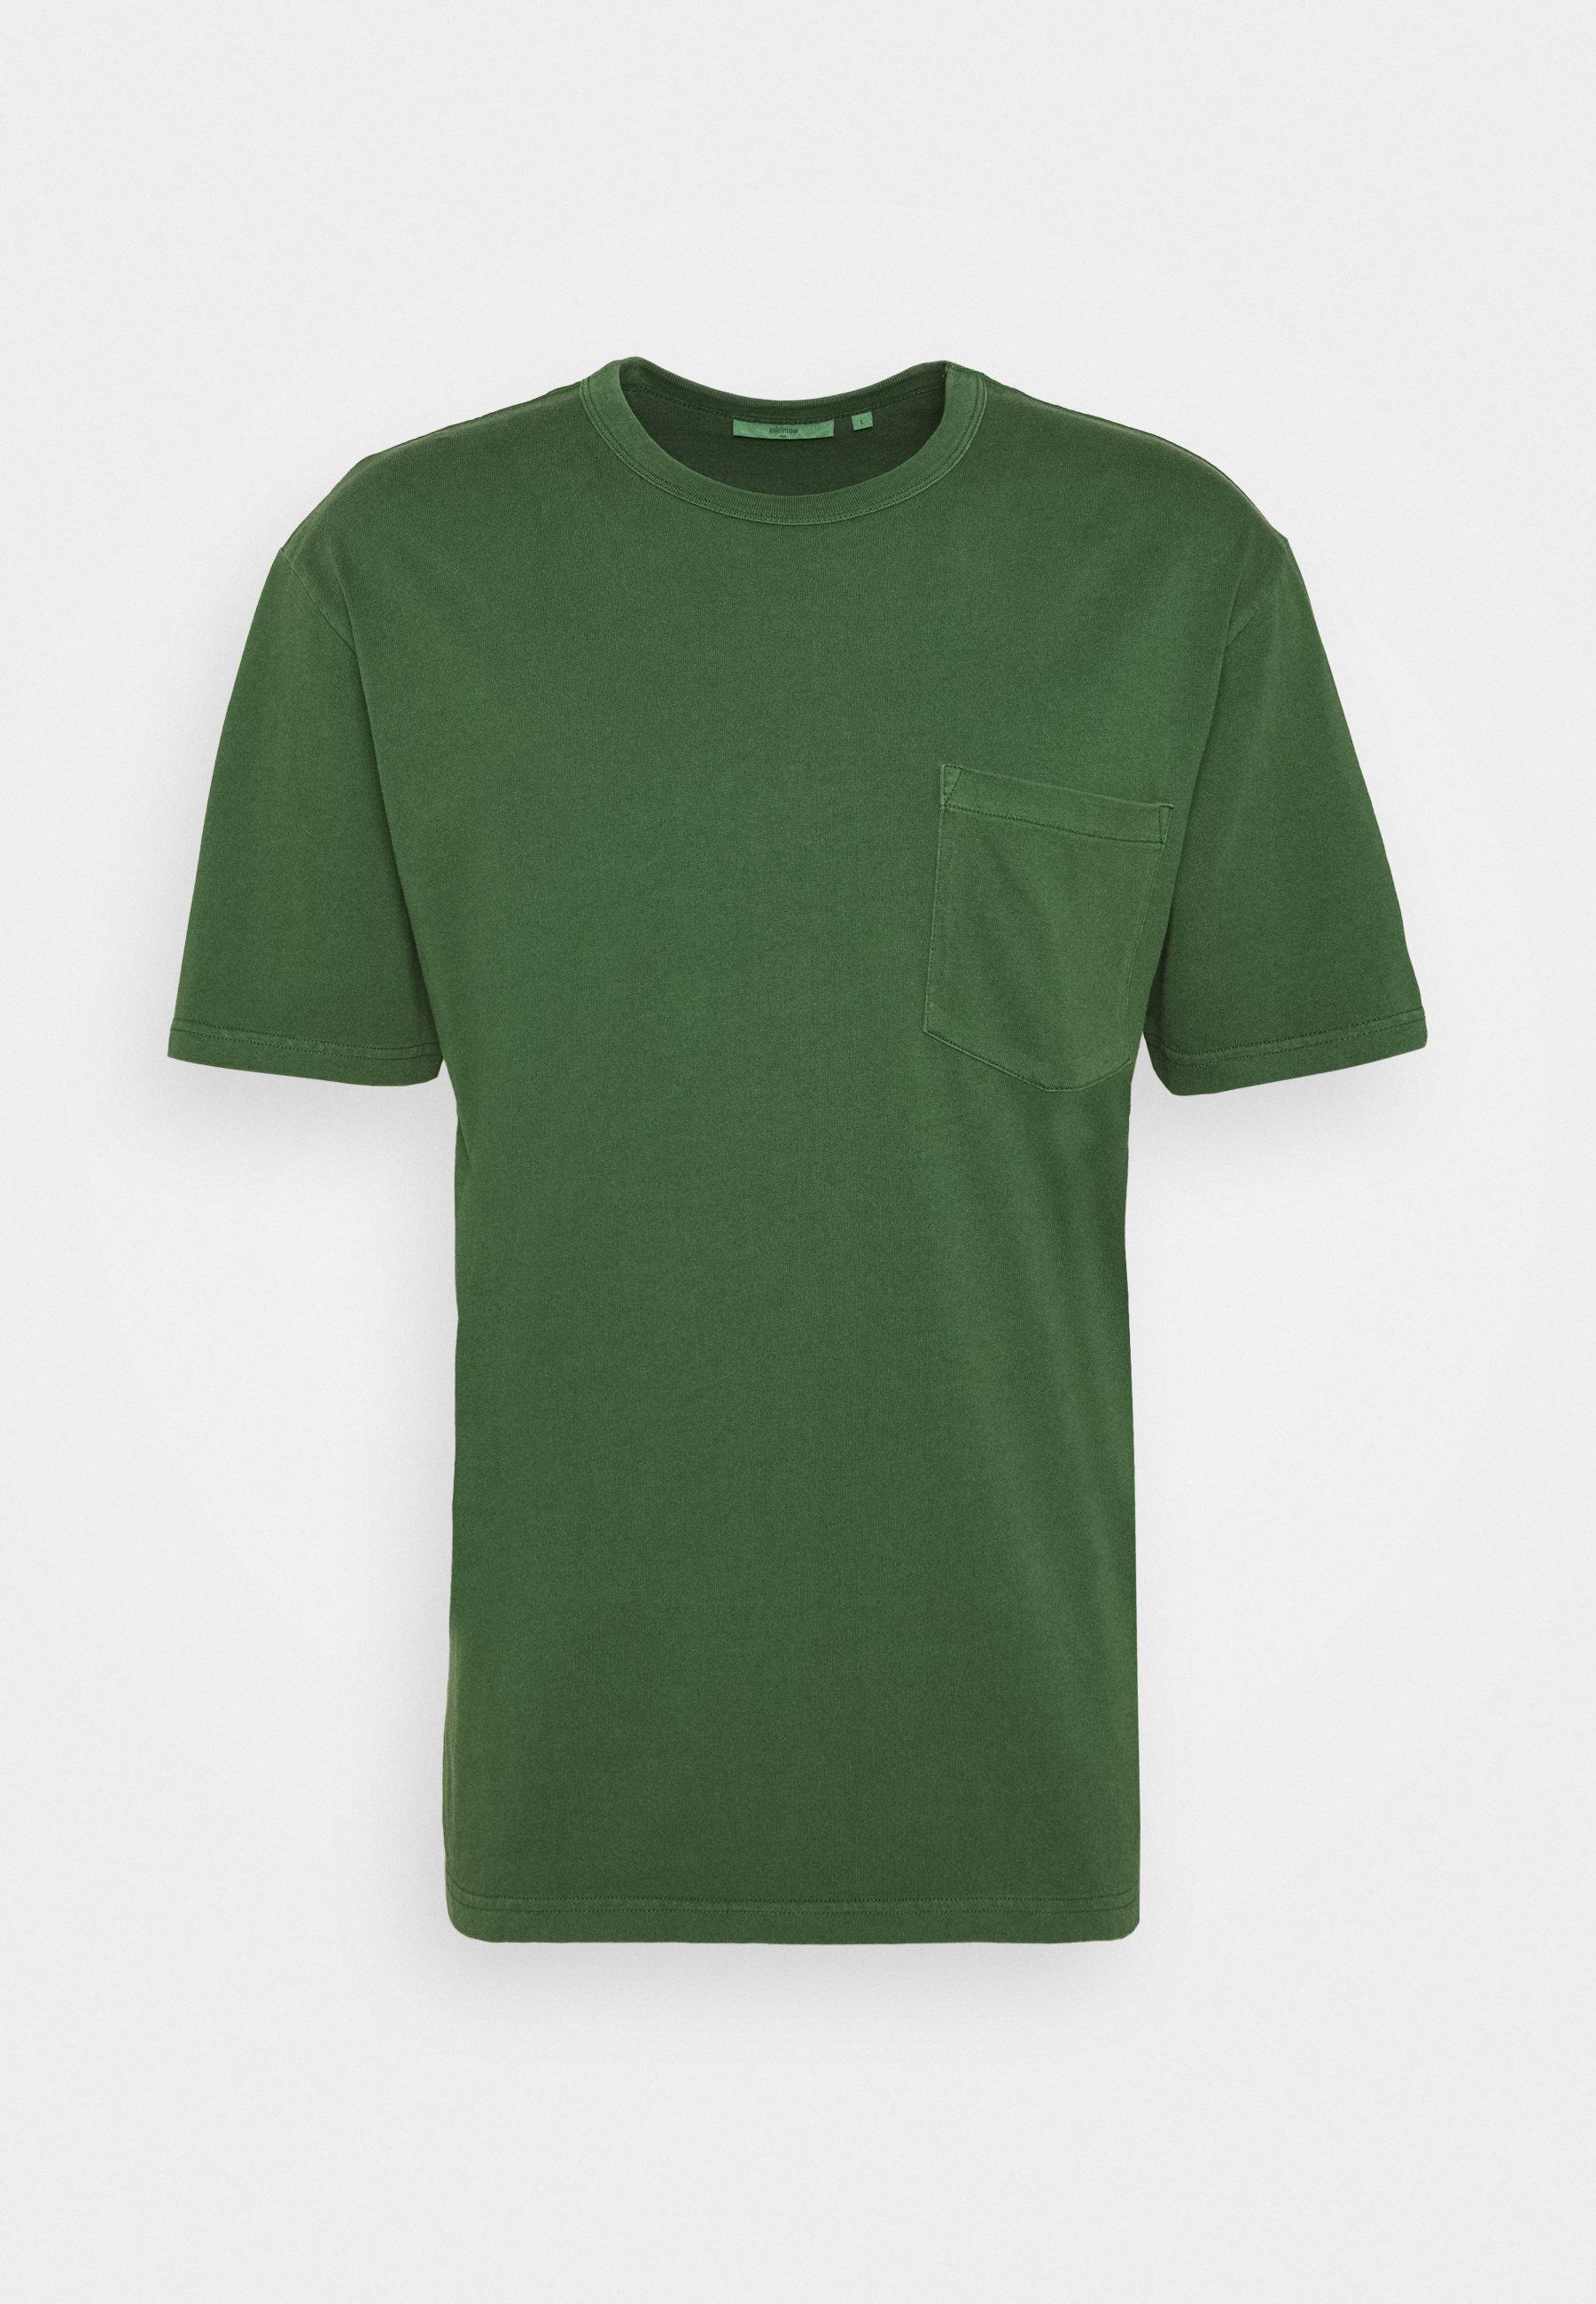 Minimum Haris - T-shirts Greener Pastures